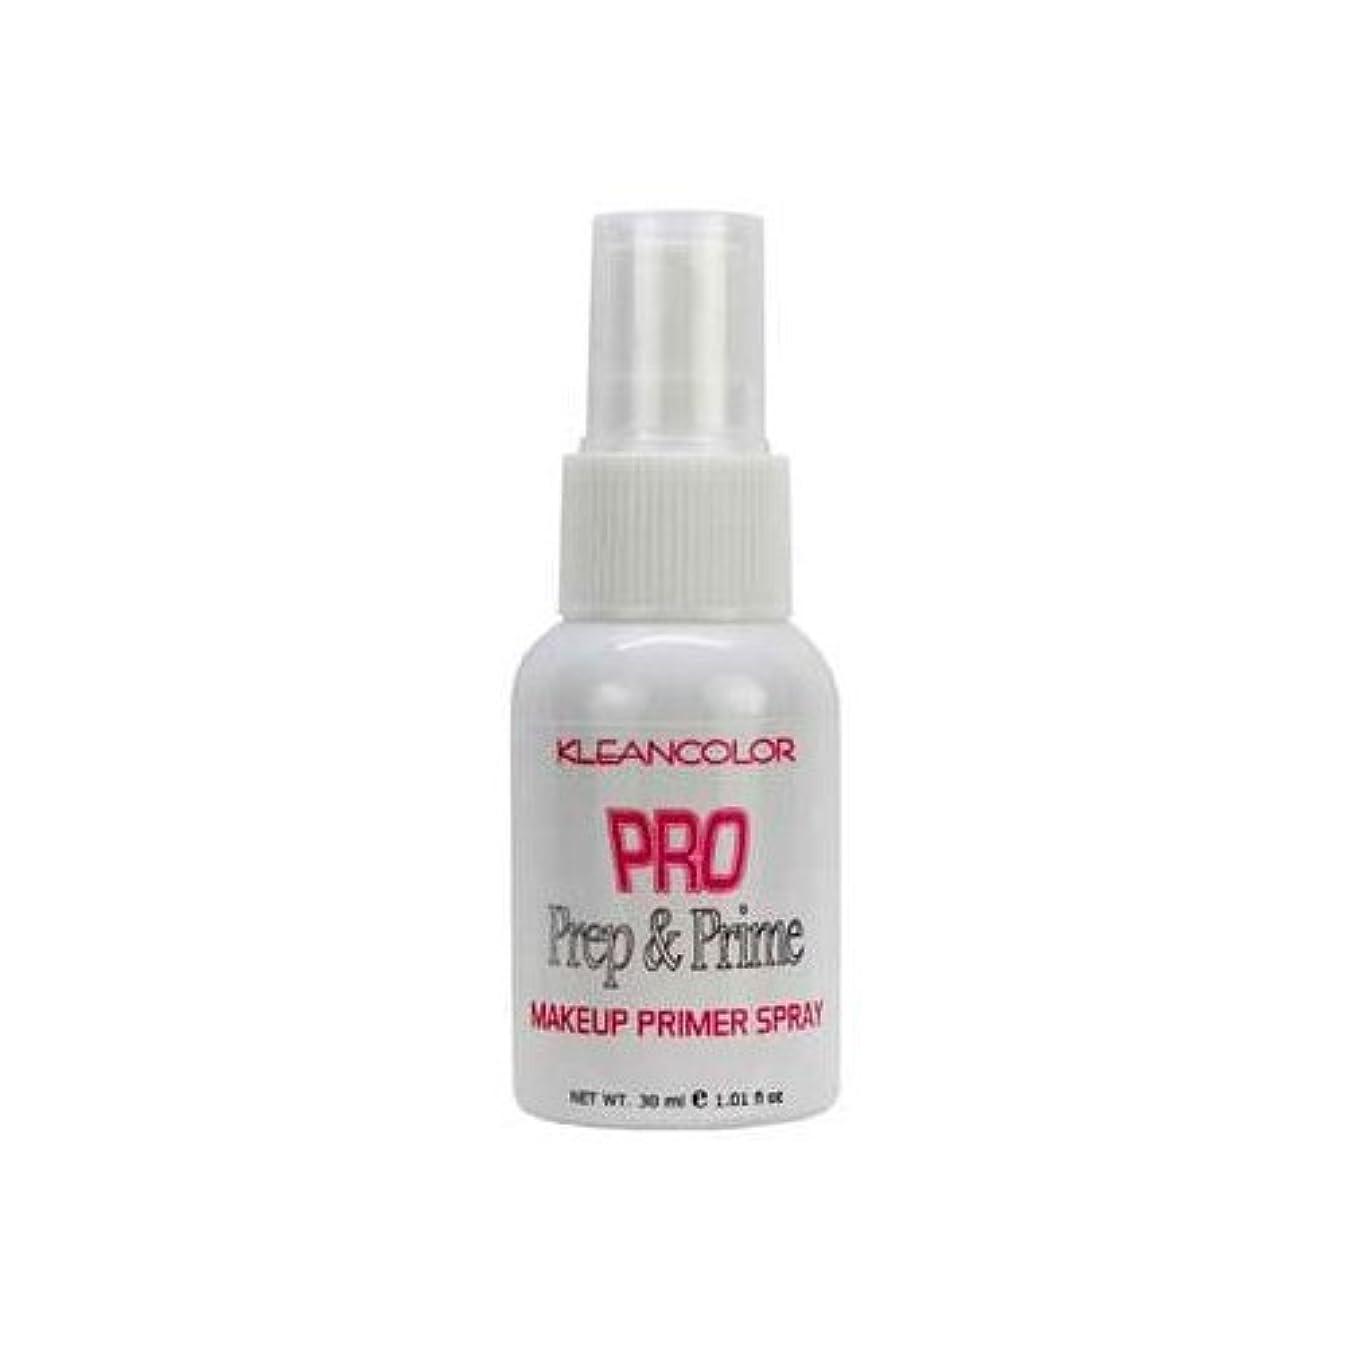 (3 Pack) KLEANCOLOR Pro Prep and Prime - Makeup Primer Spray (並行輸入品)